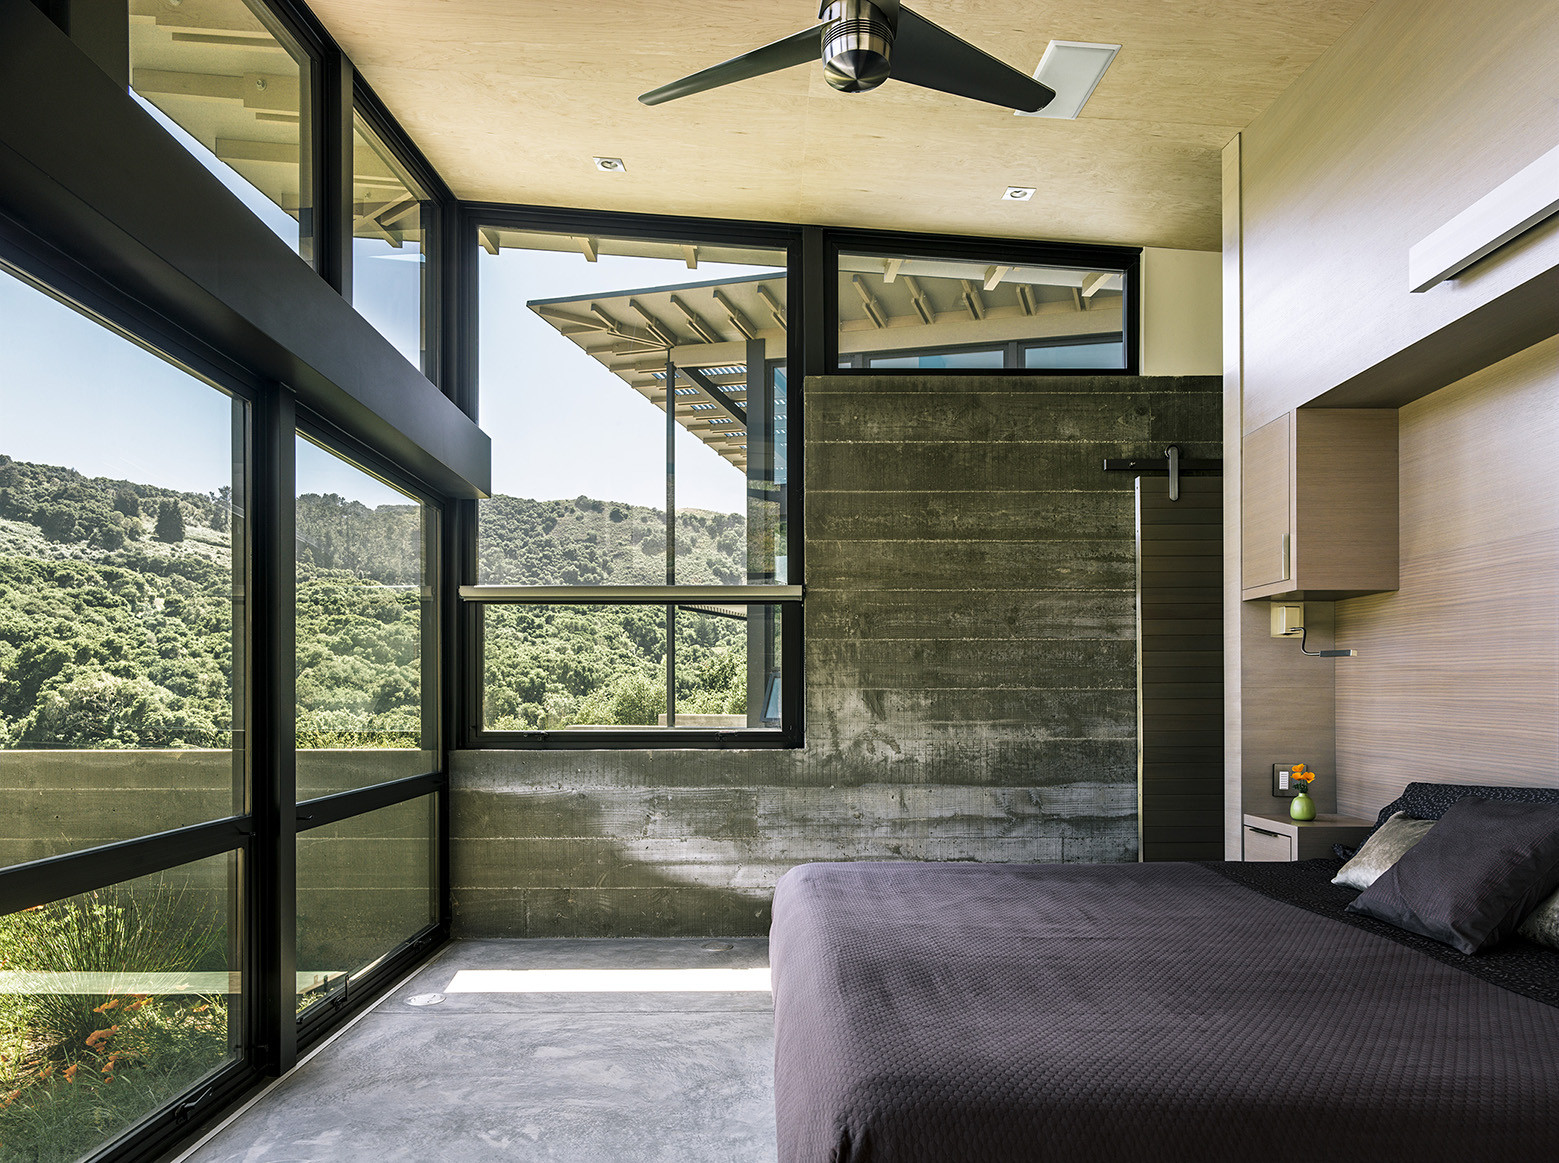 Gallery of Butterfly House / Feldman Architecture - 10